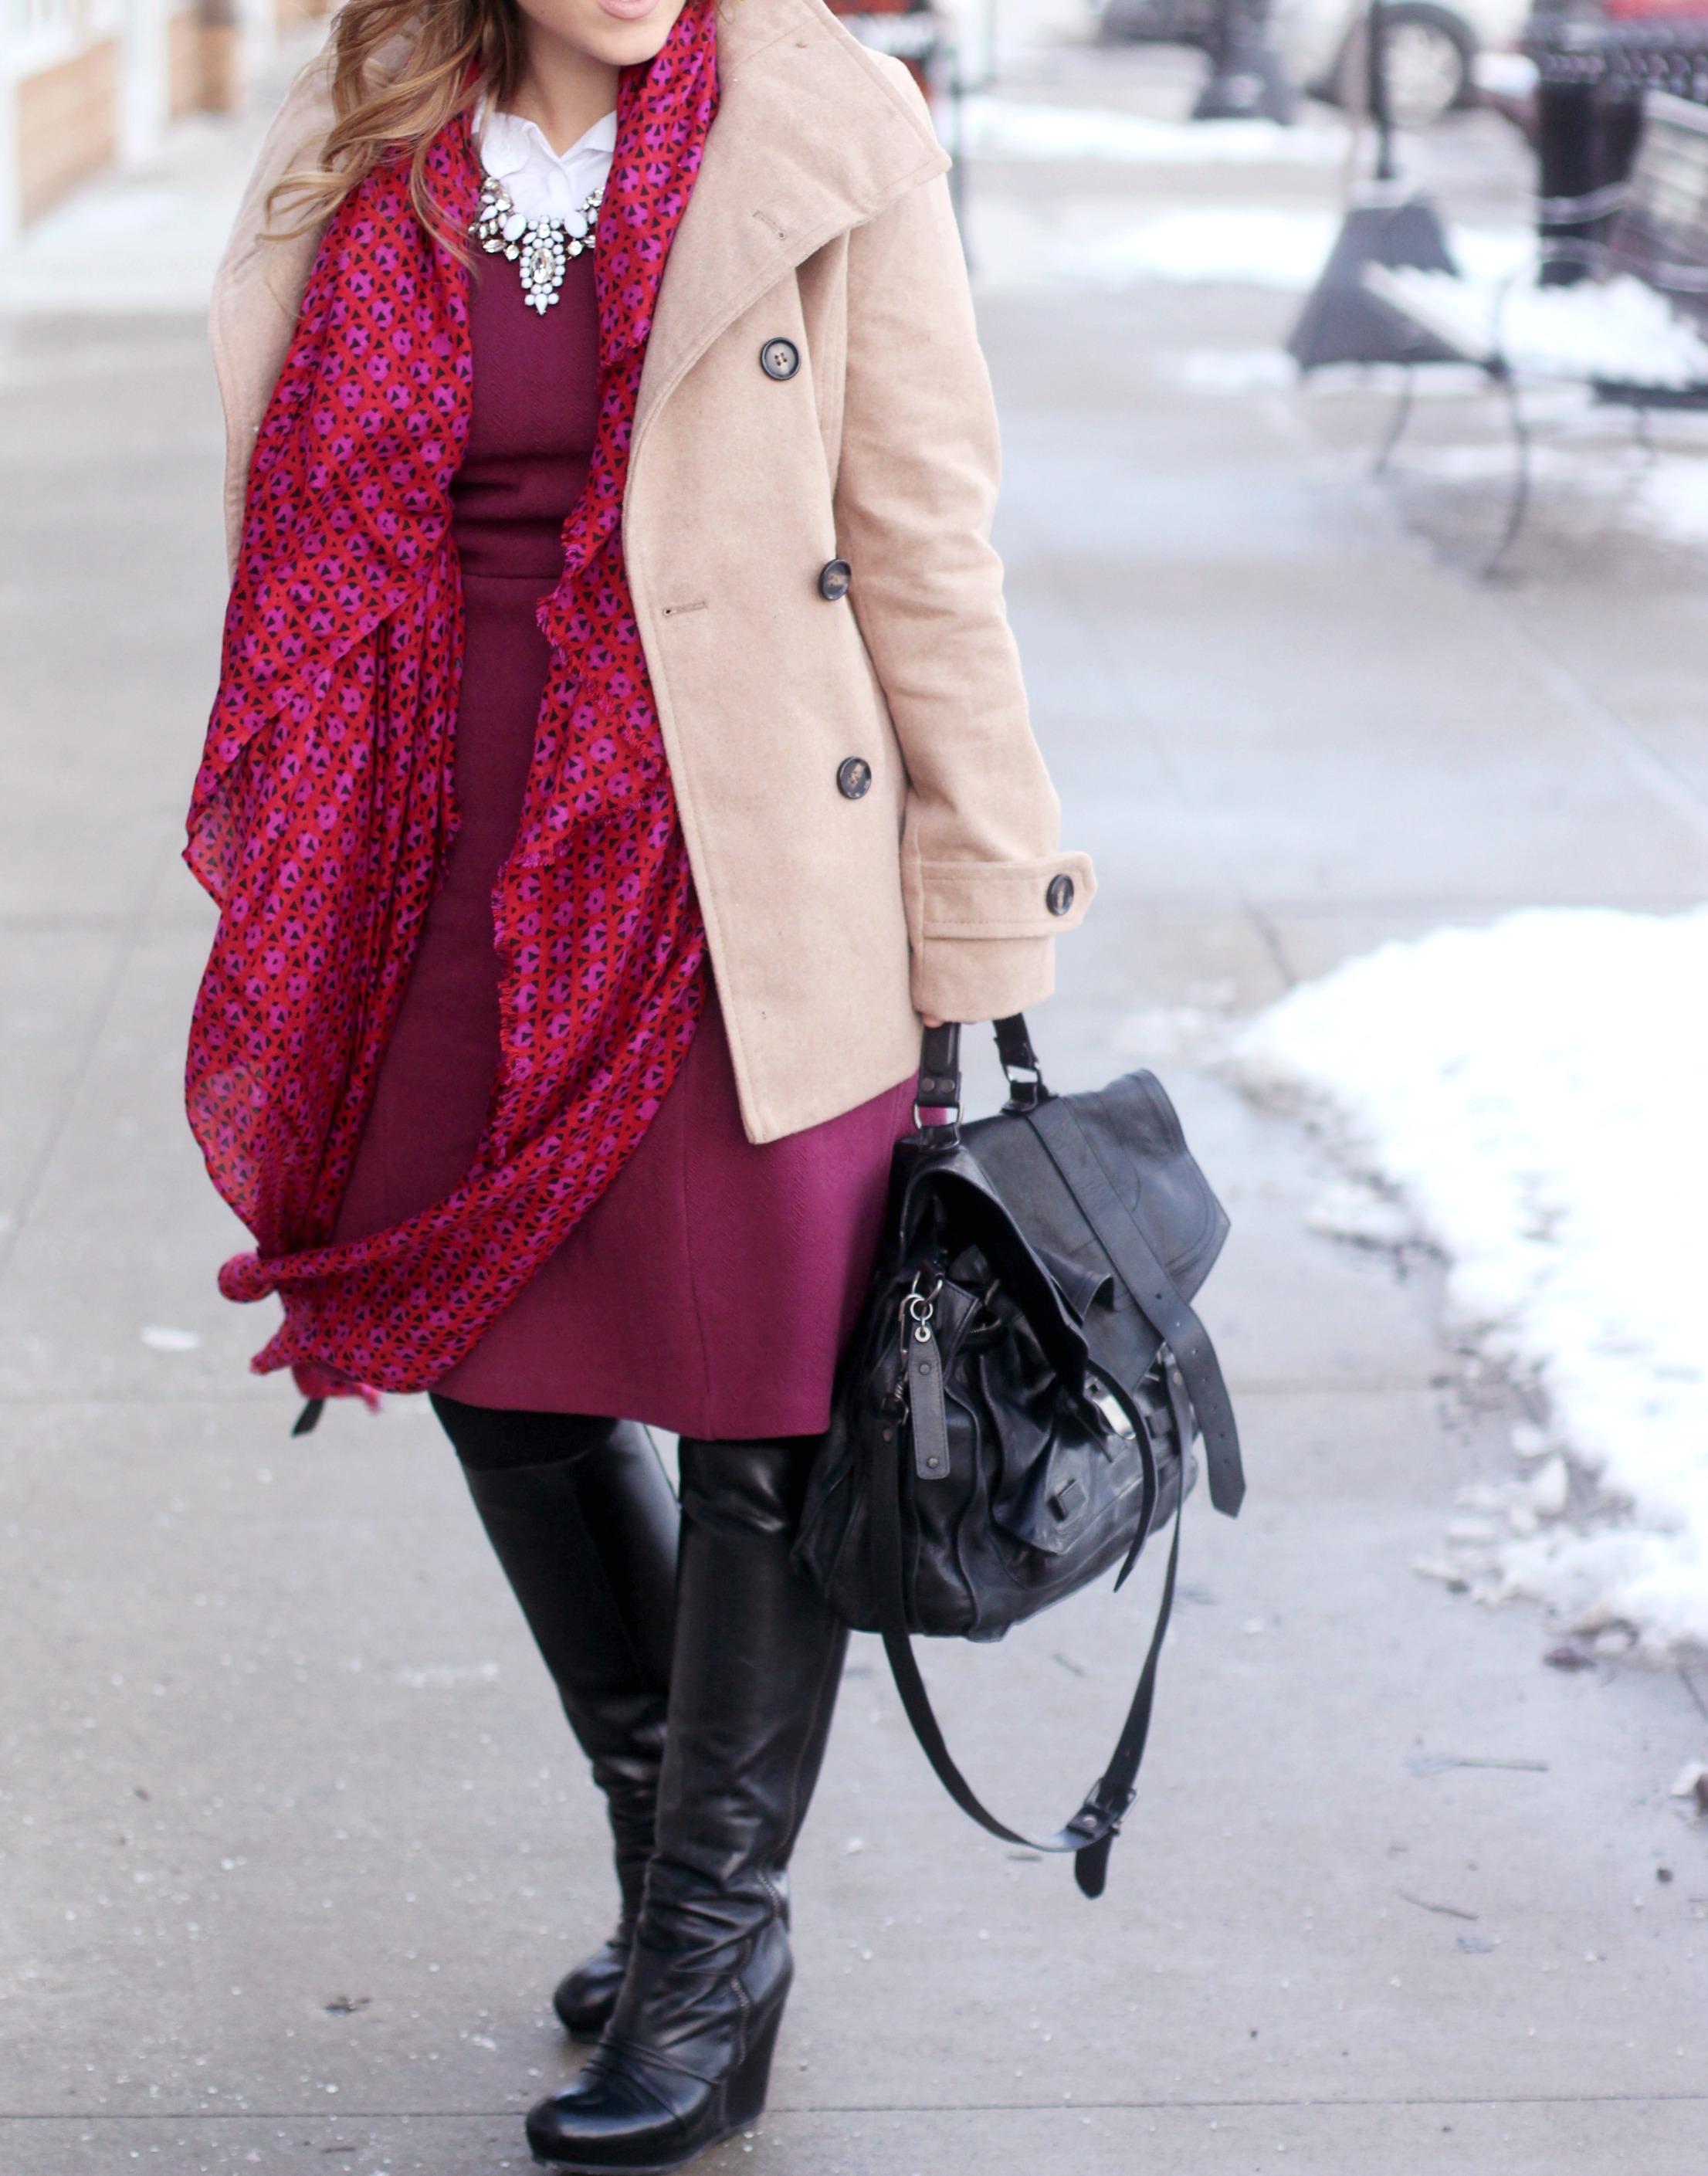 wearing dresses in winter zoe with love